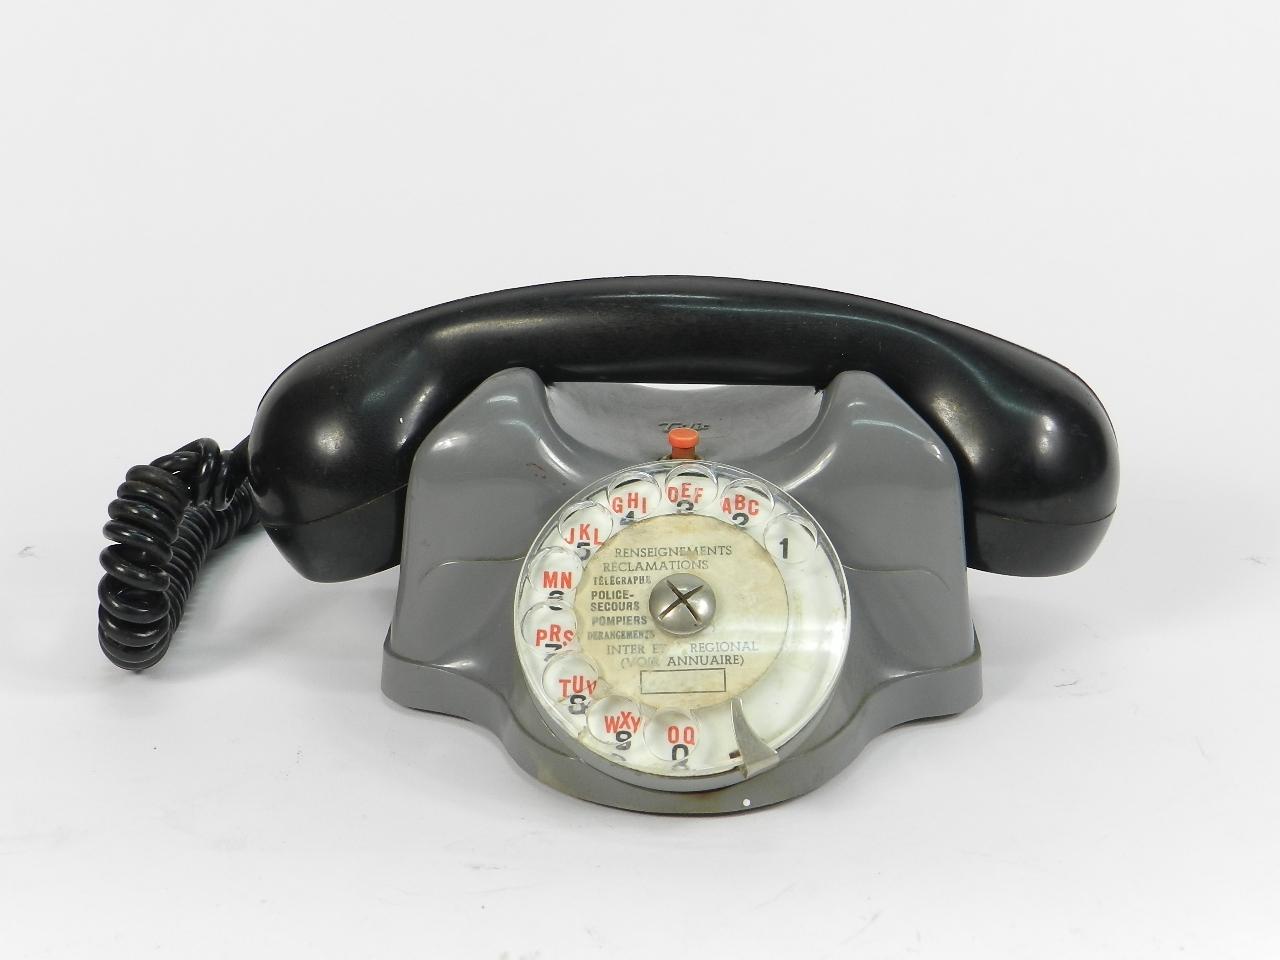 Imagen TELEFONO TÉLIC  AÑO 1950, ESTRASBURGO 41519